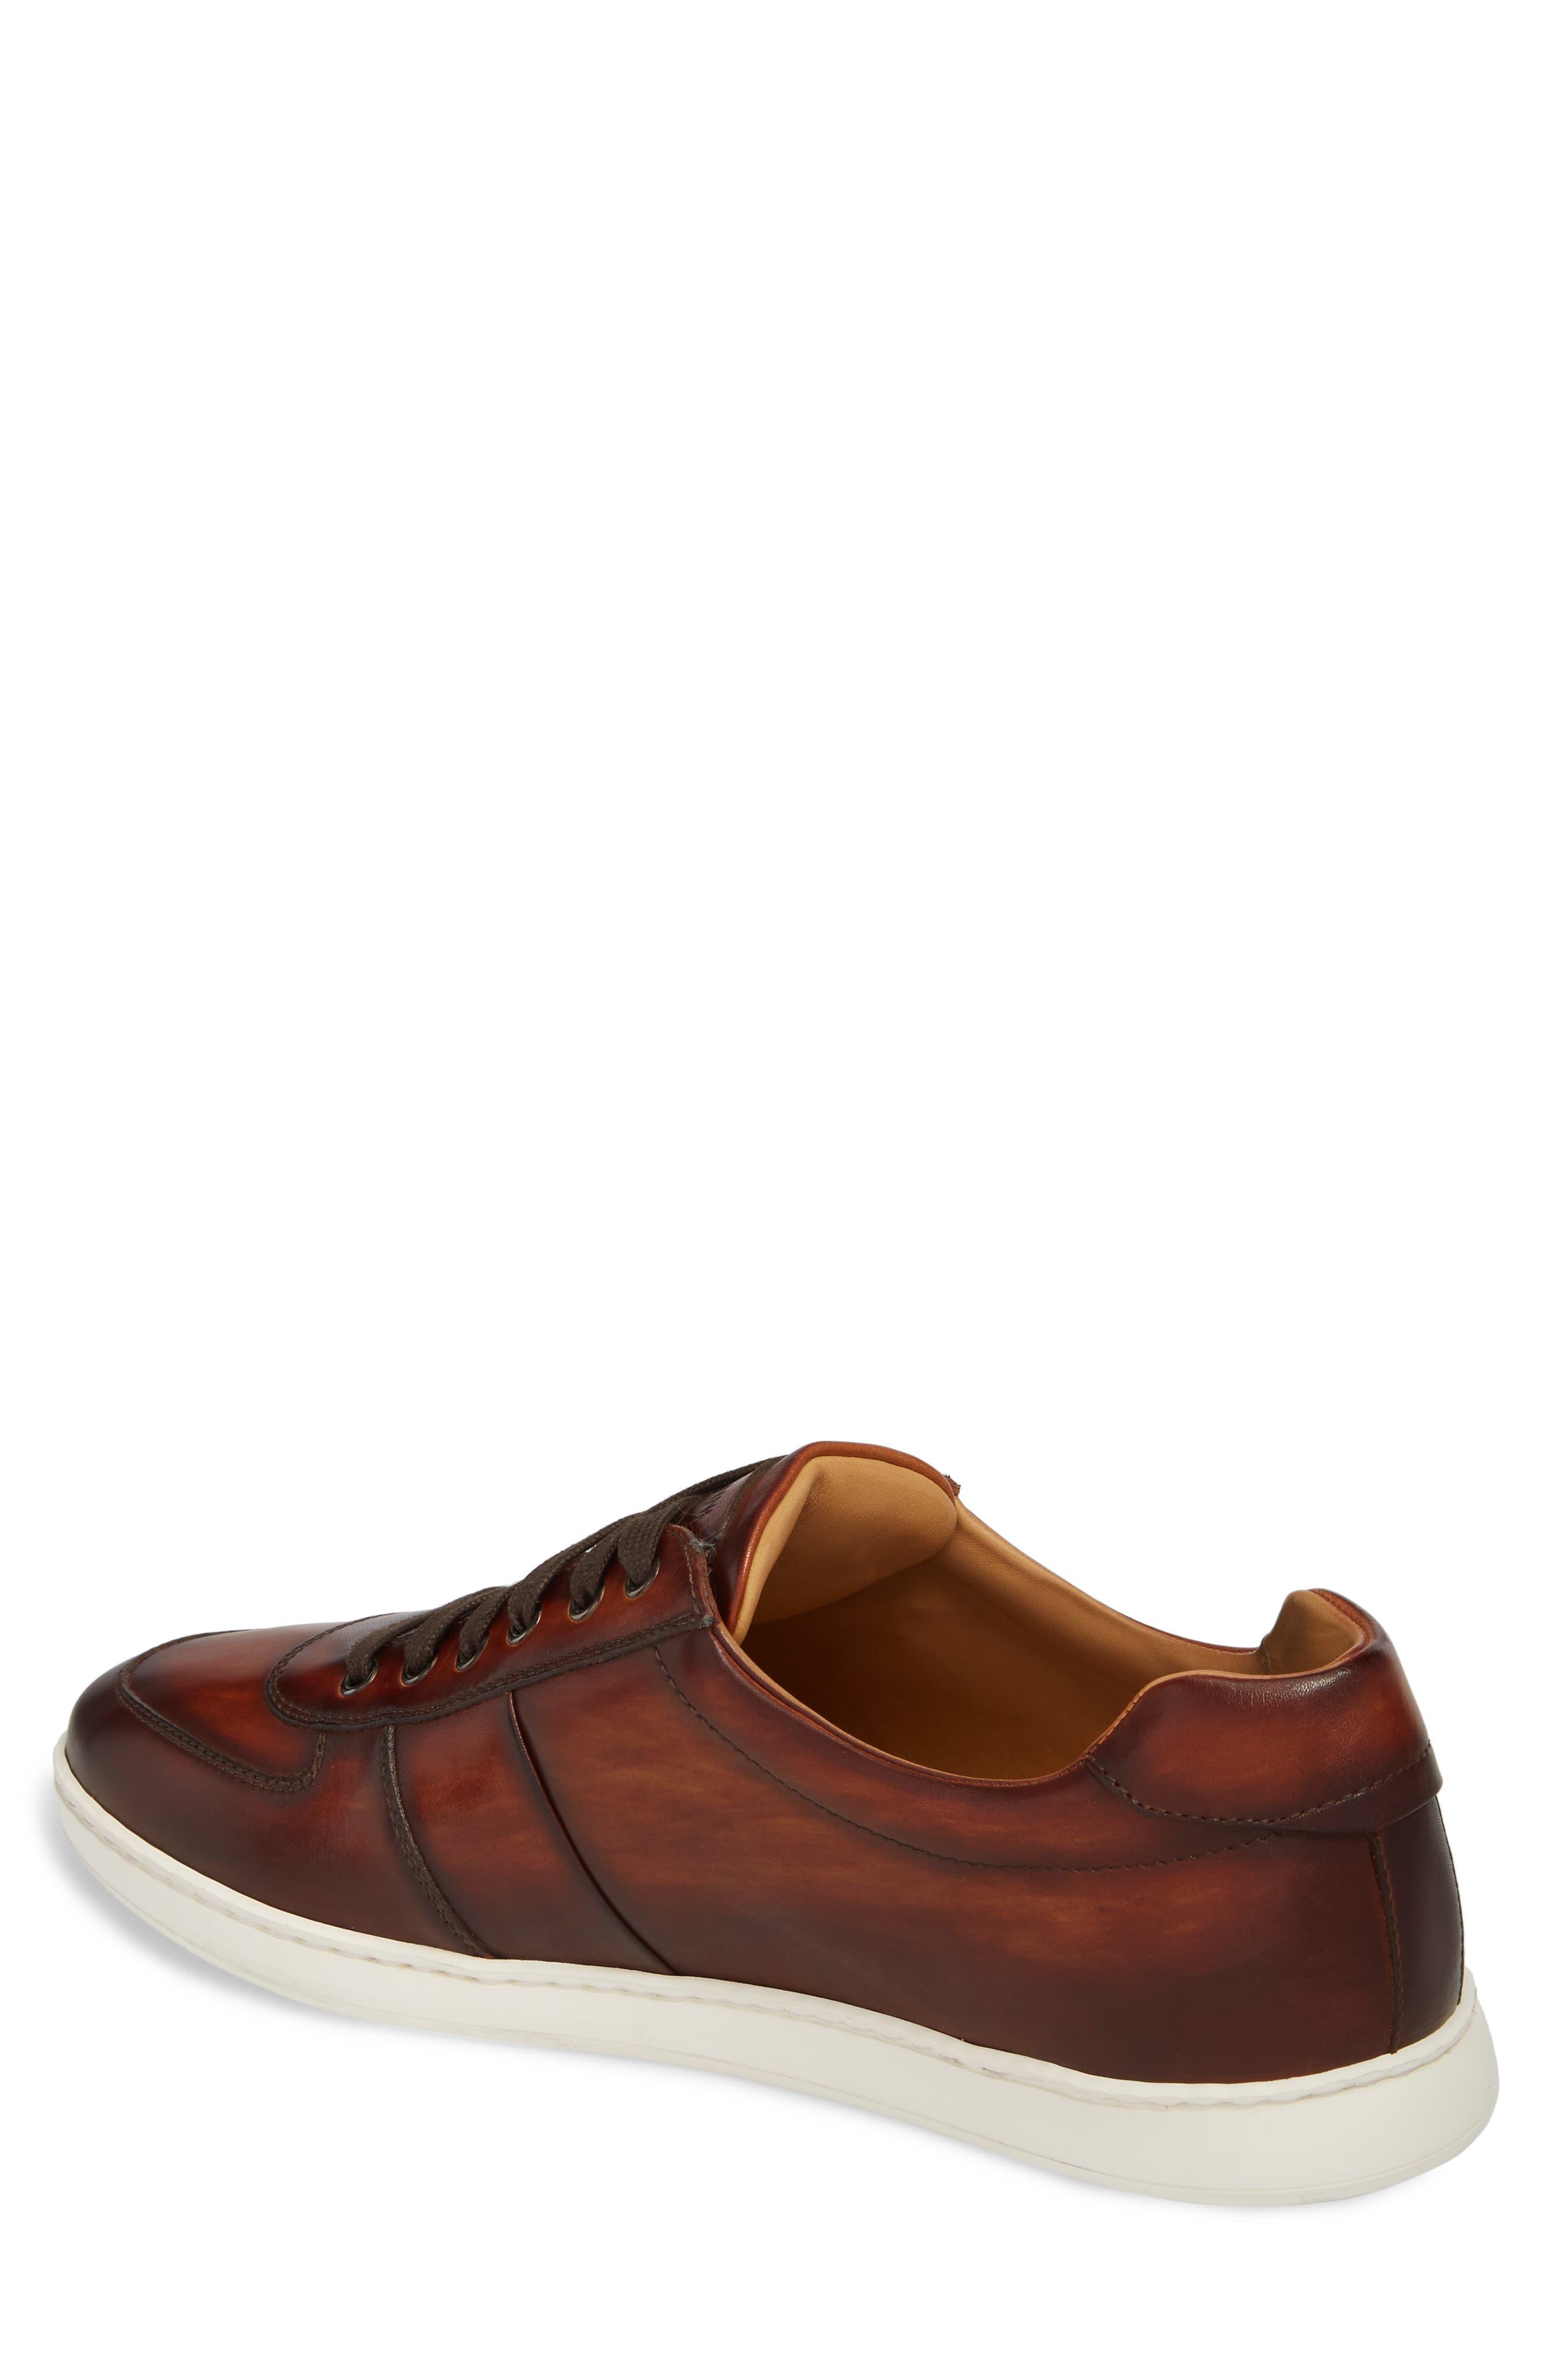 Magnanni Men's Franco Low Top Sneaker r9Nfluu